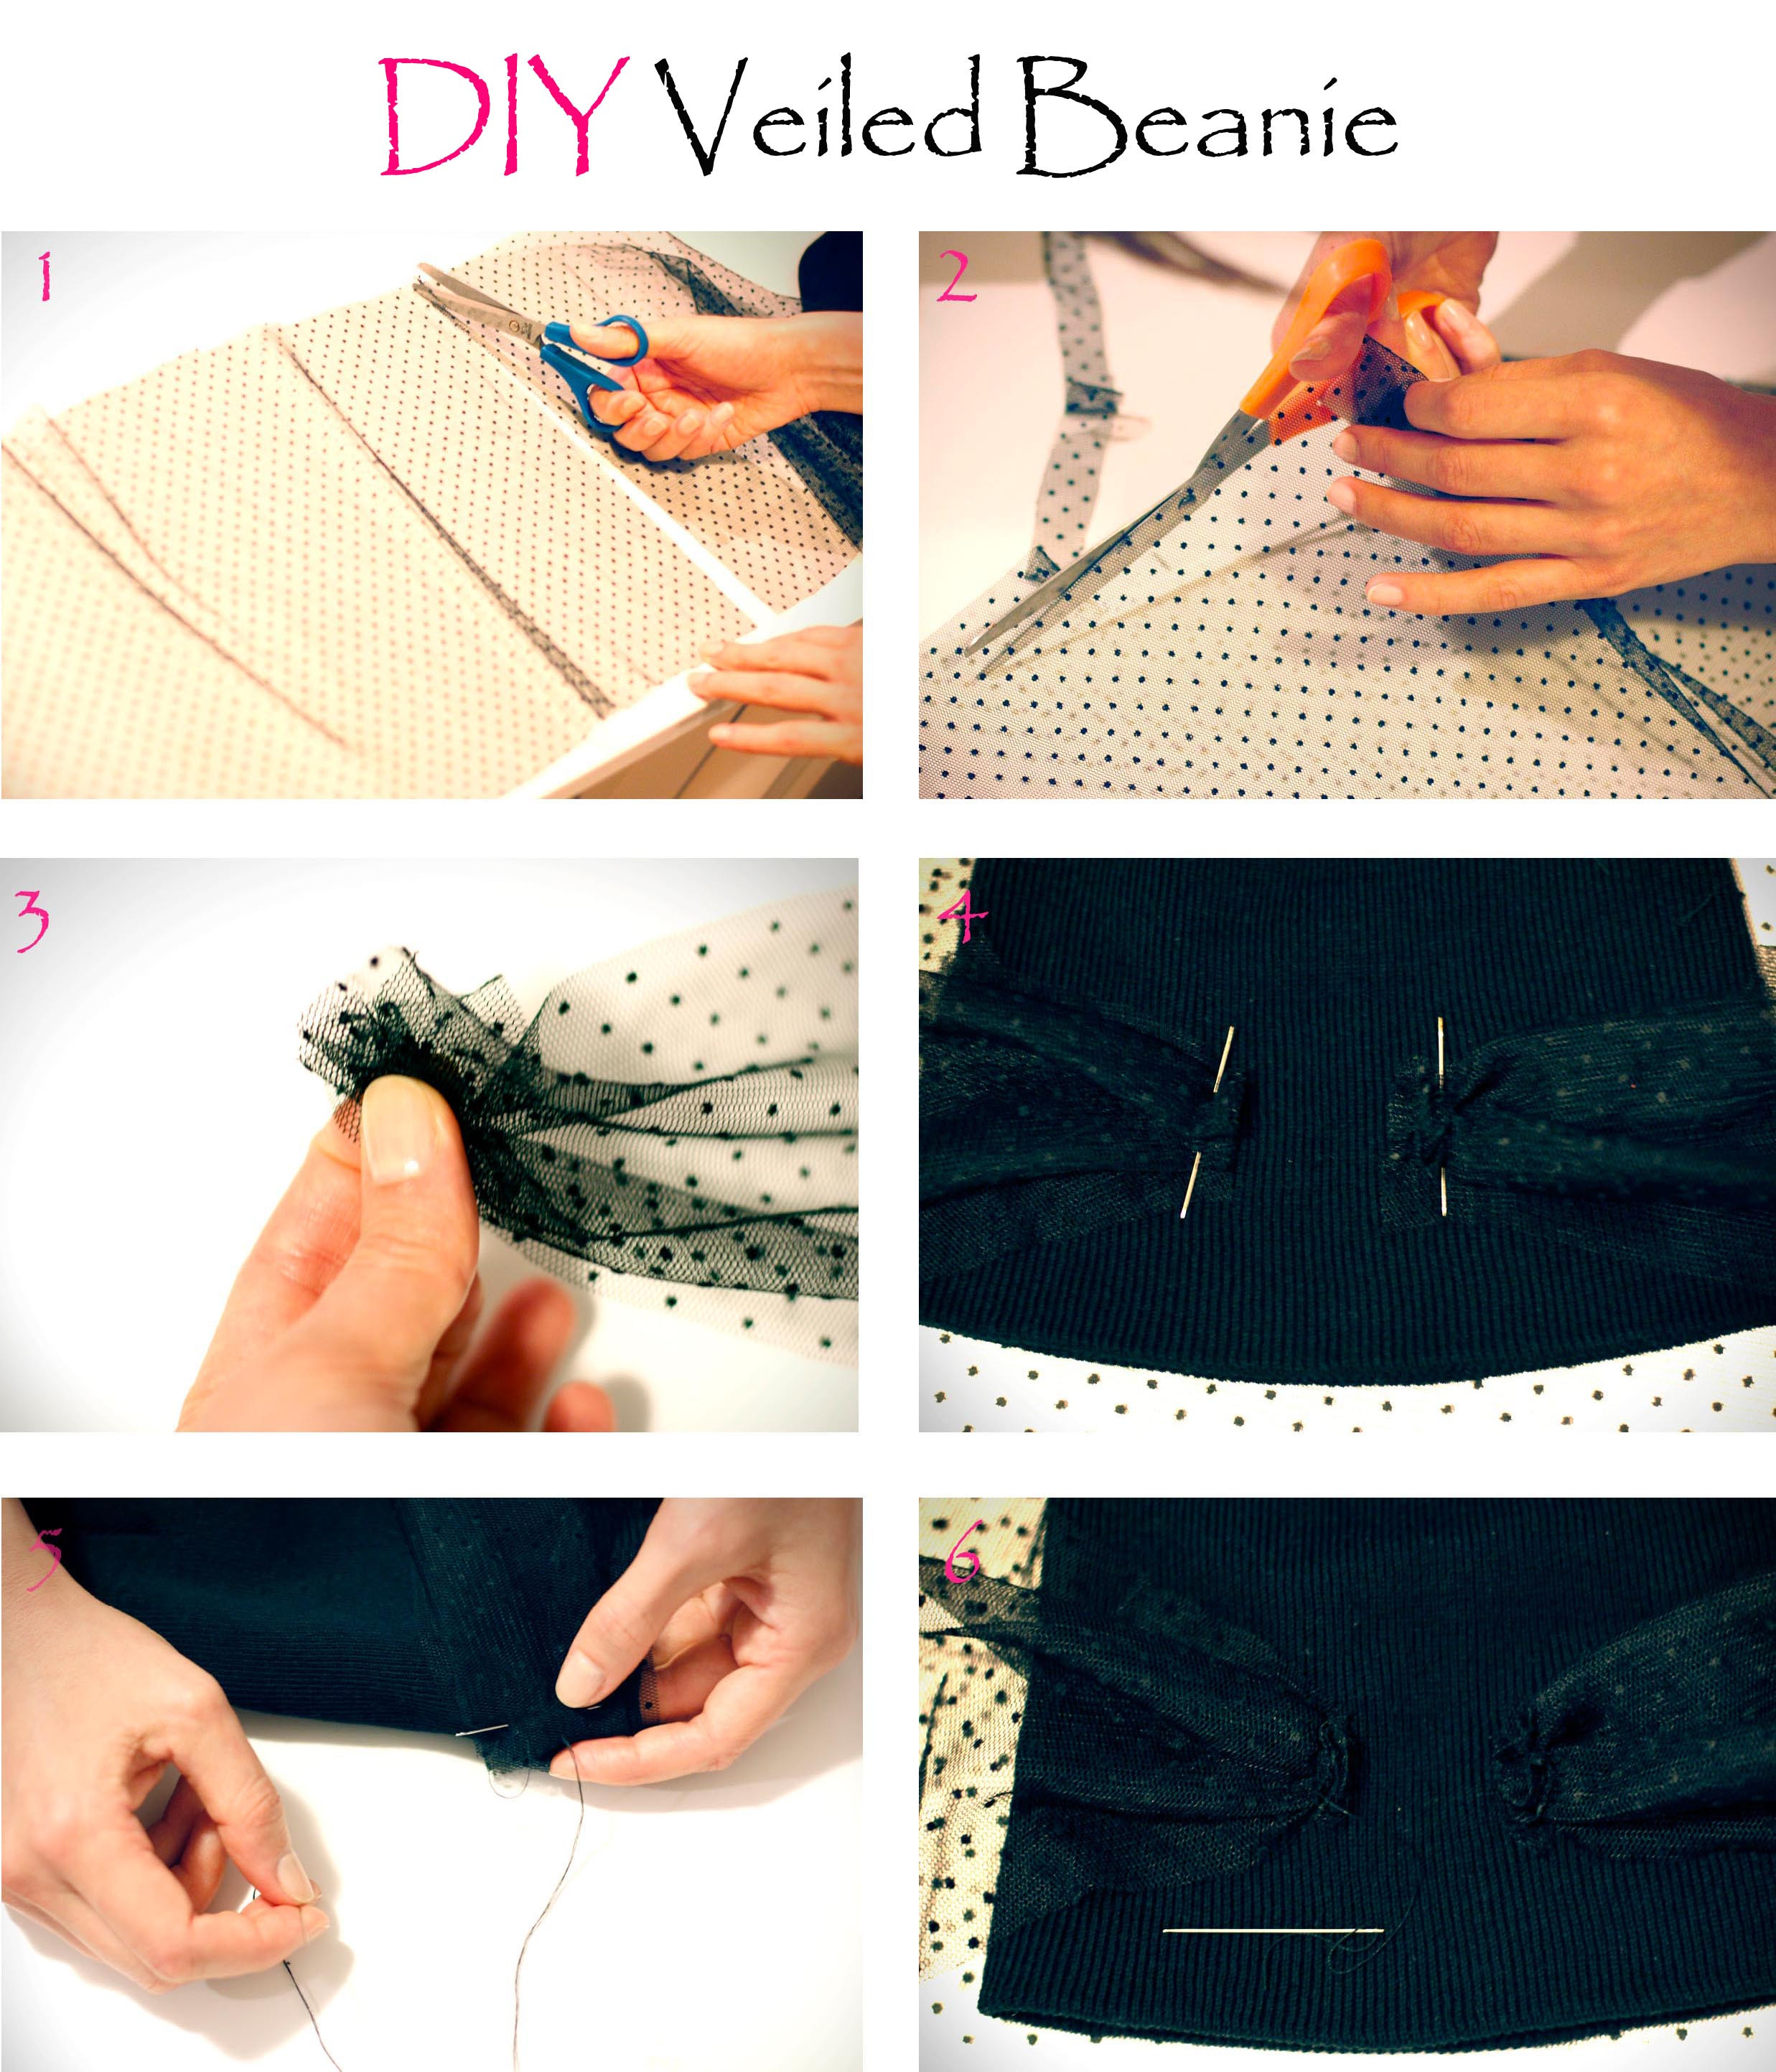 Diy Trend  CrashingRED DIY Jil Sander inspired veiled beanie